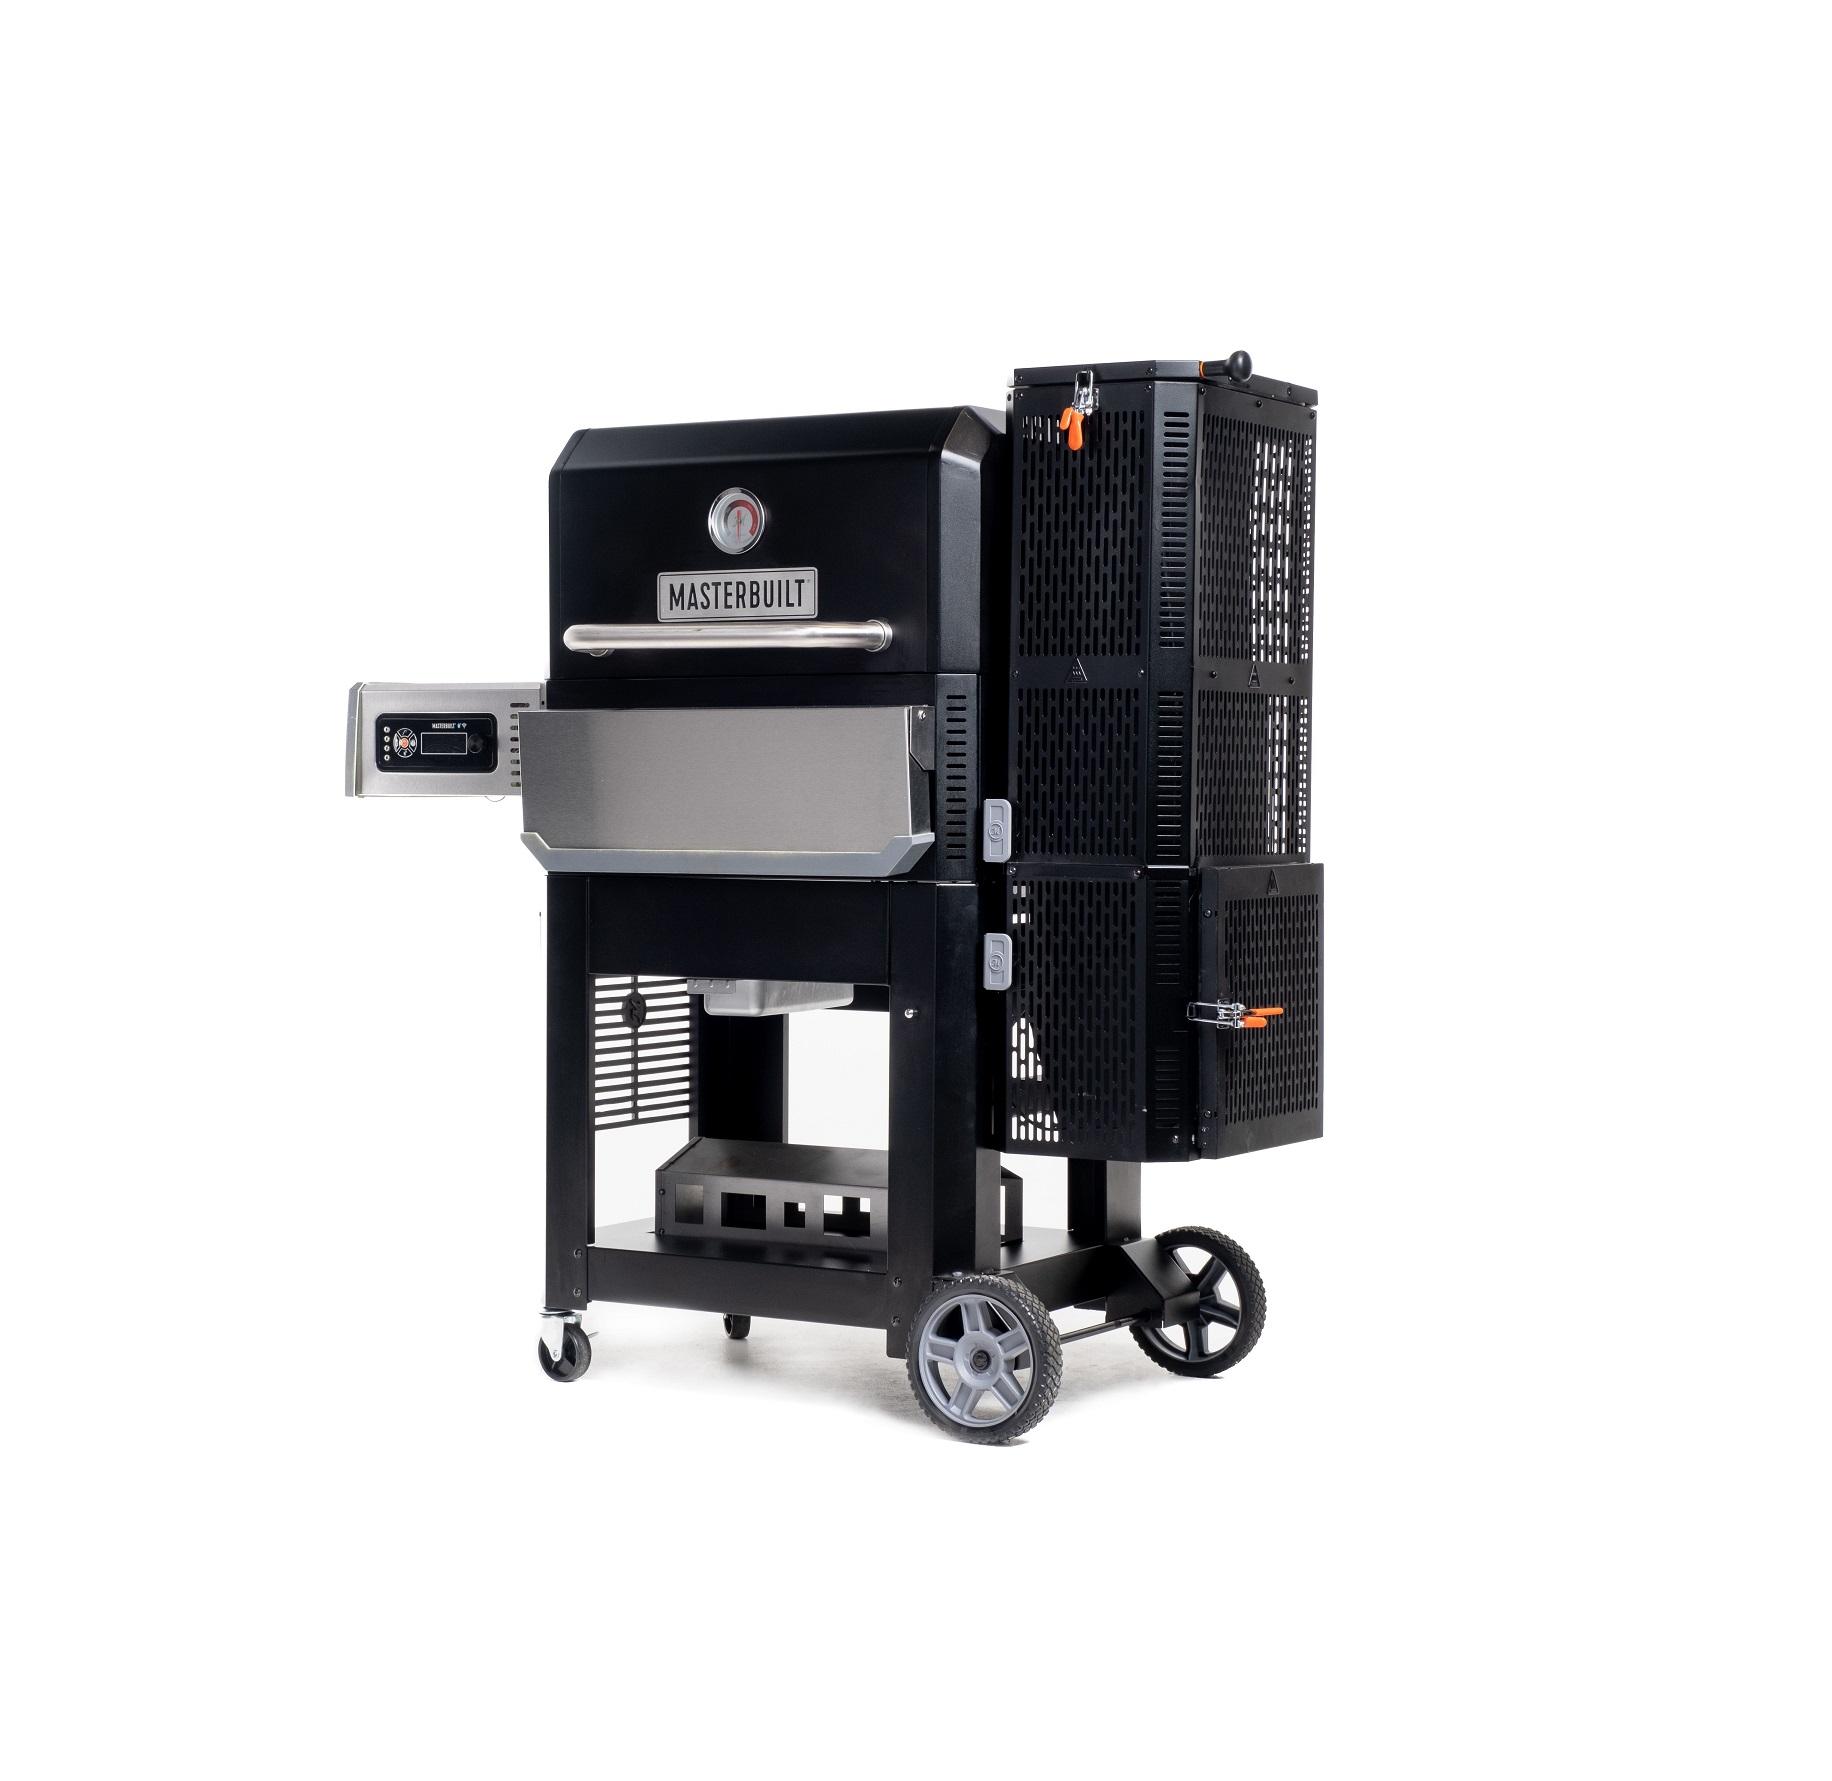 Masterbuilt Gravity Series 800 Digital Charcoal Grill & Smoker